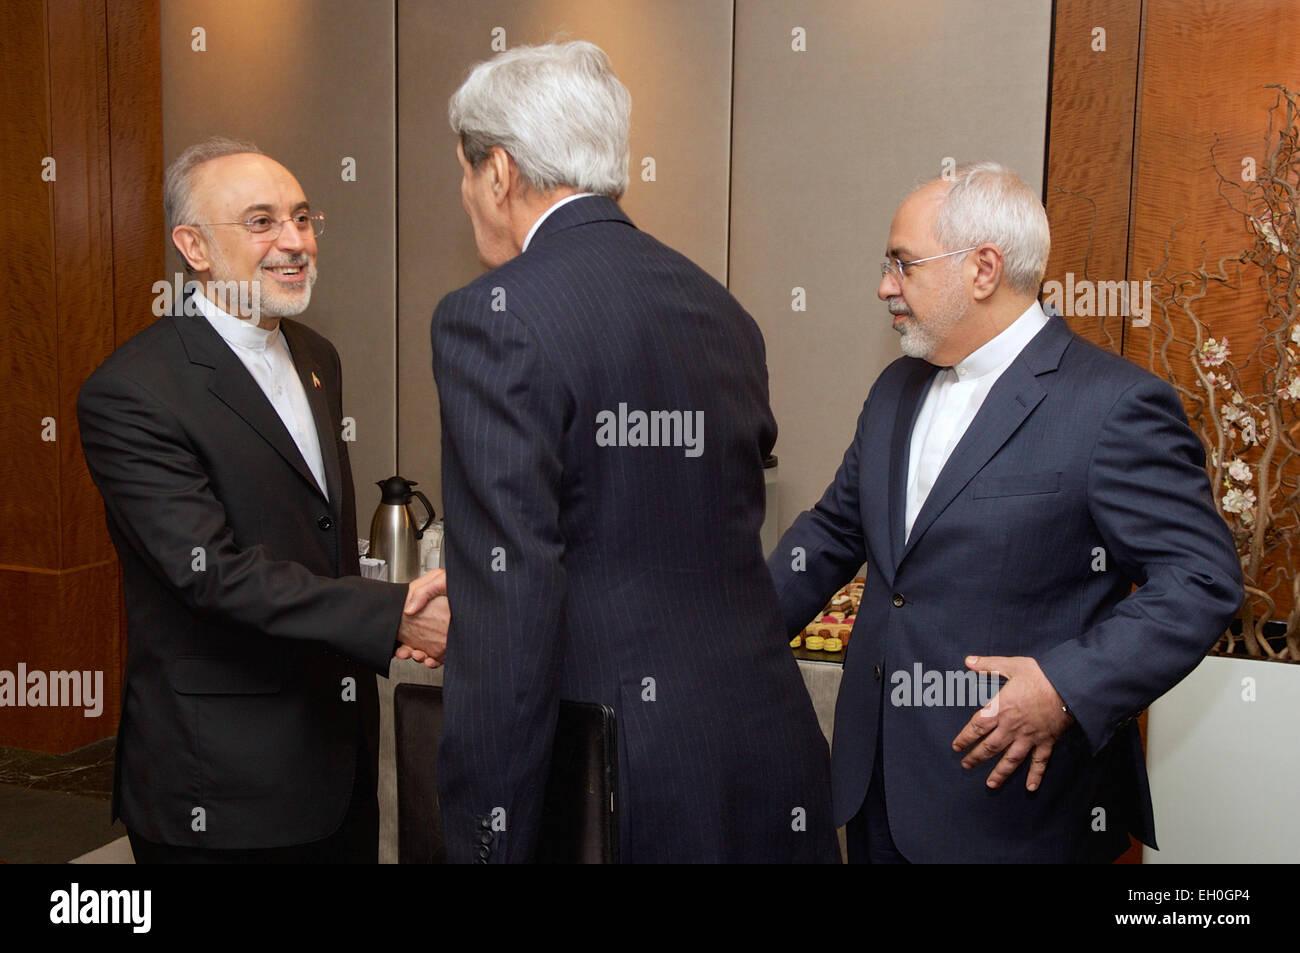 Iran 2015 Stock Photos & Iran 2015 Stock Images - Alamy Zarif Planters Html on